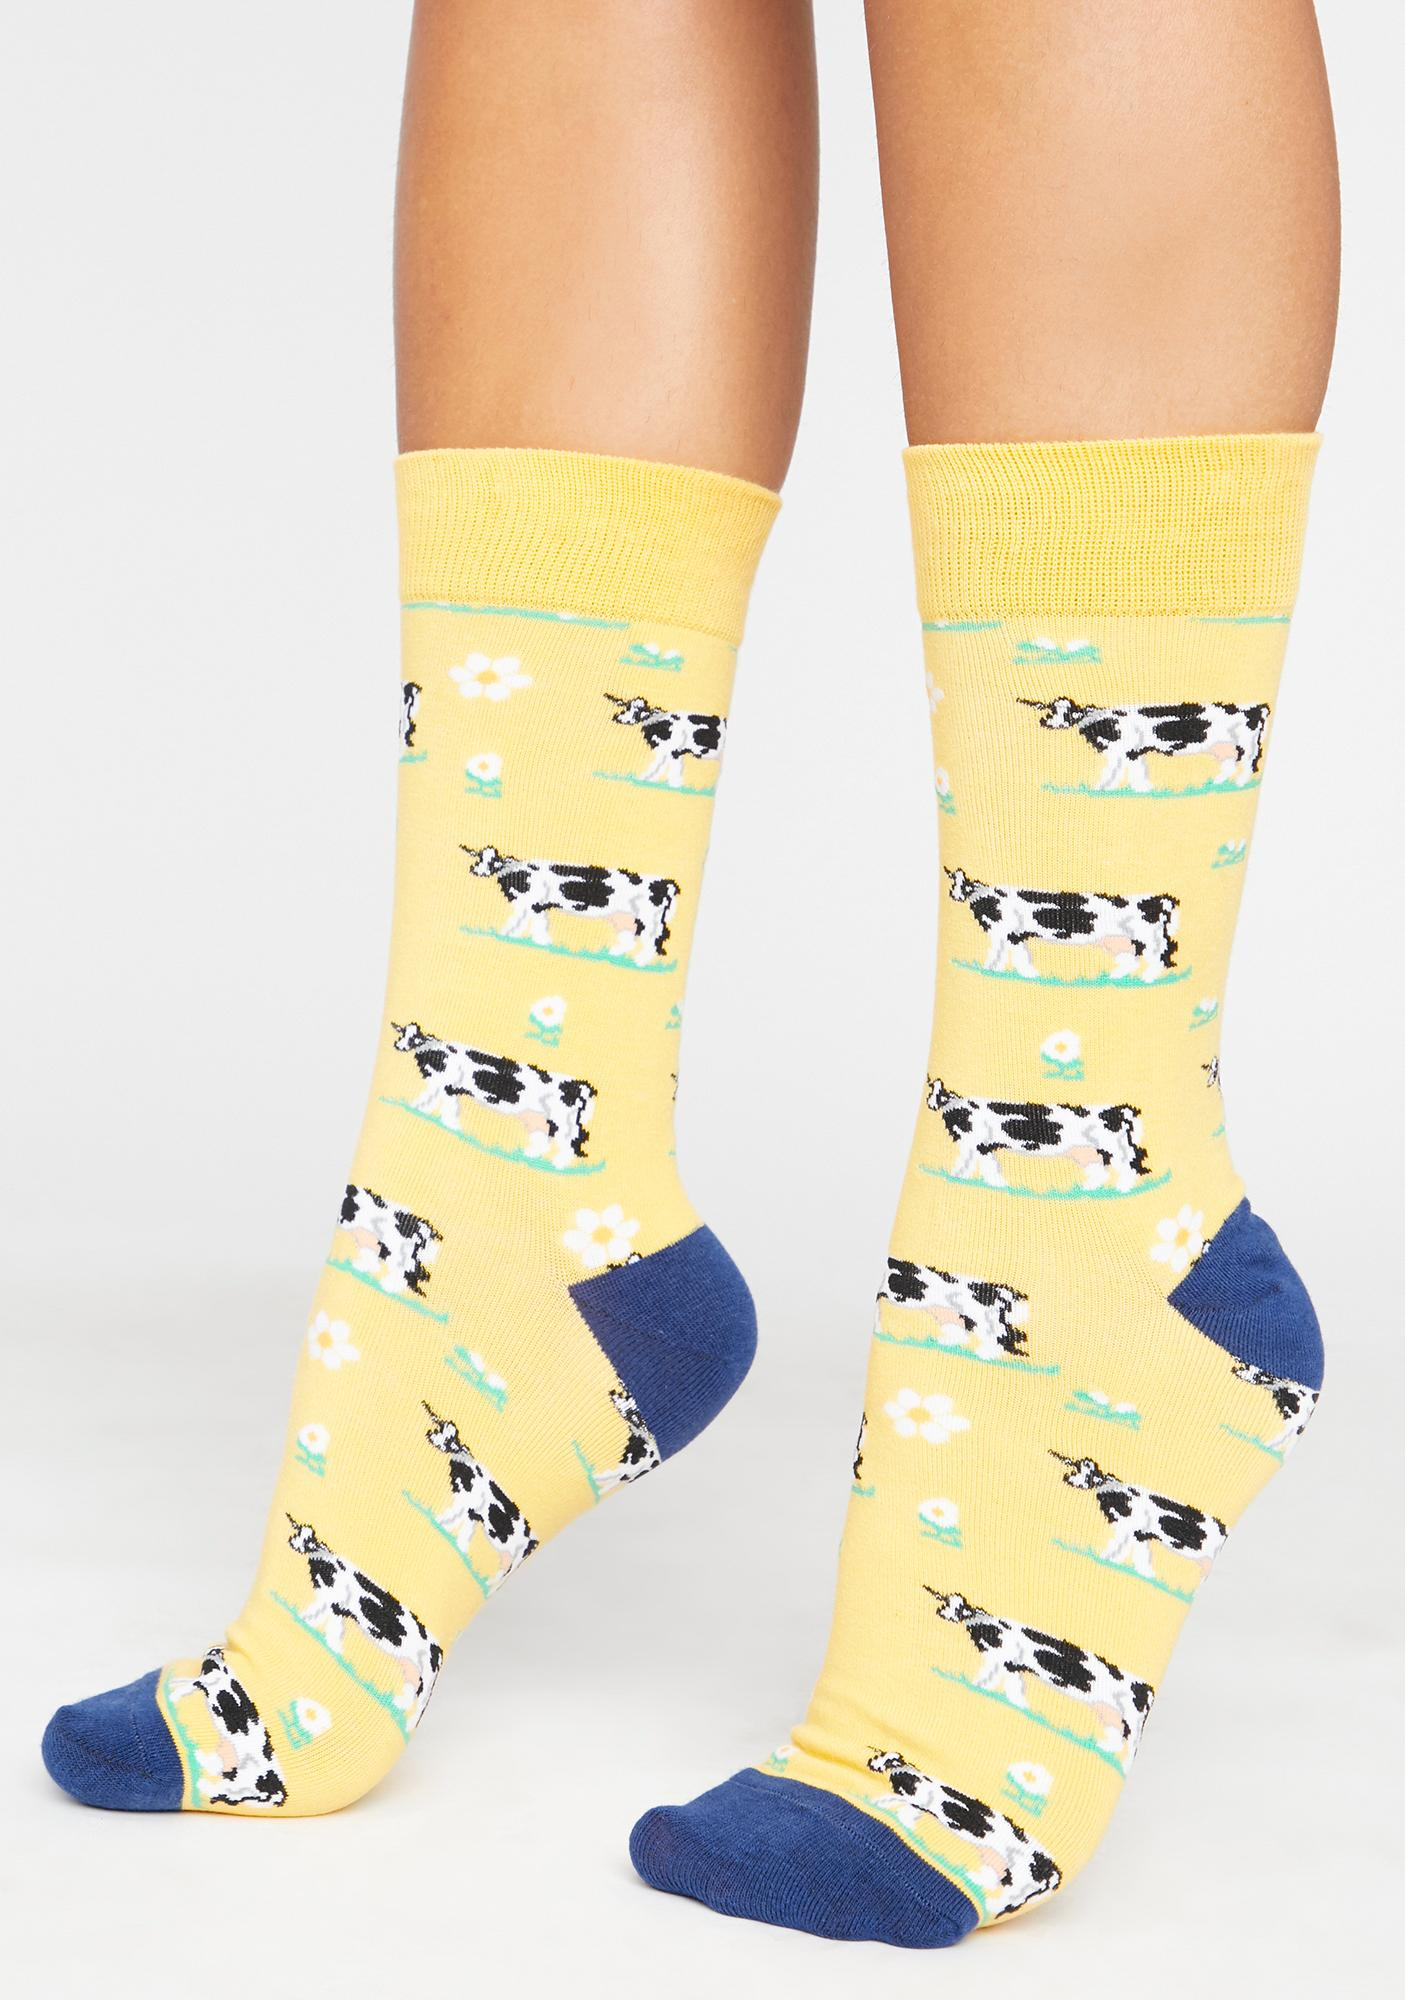 Moo'dy Bish Crew Socks